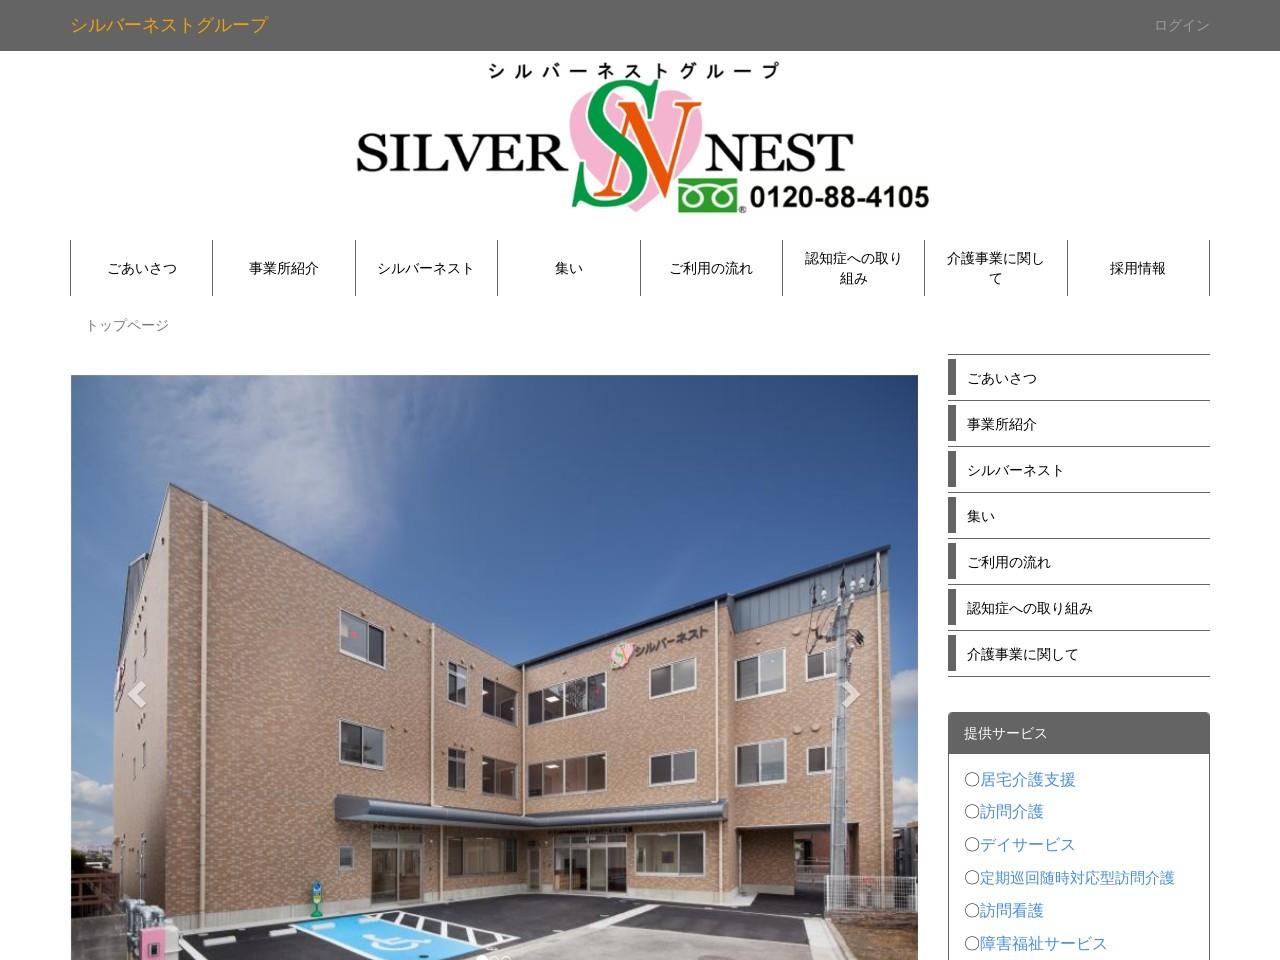 Silvernest-シルバーネスト-